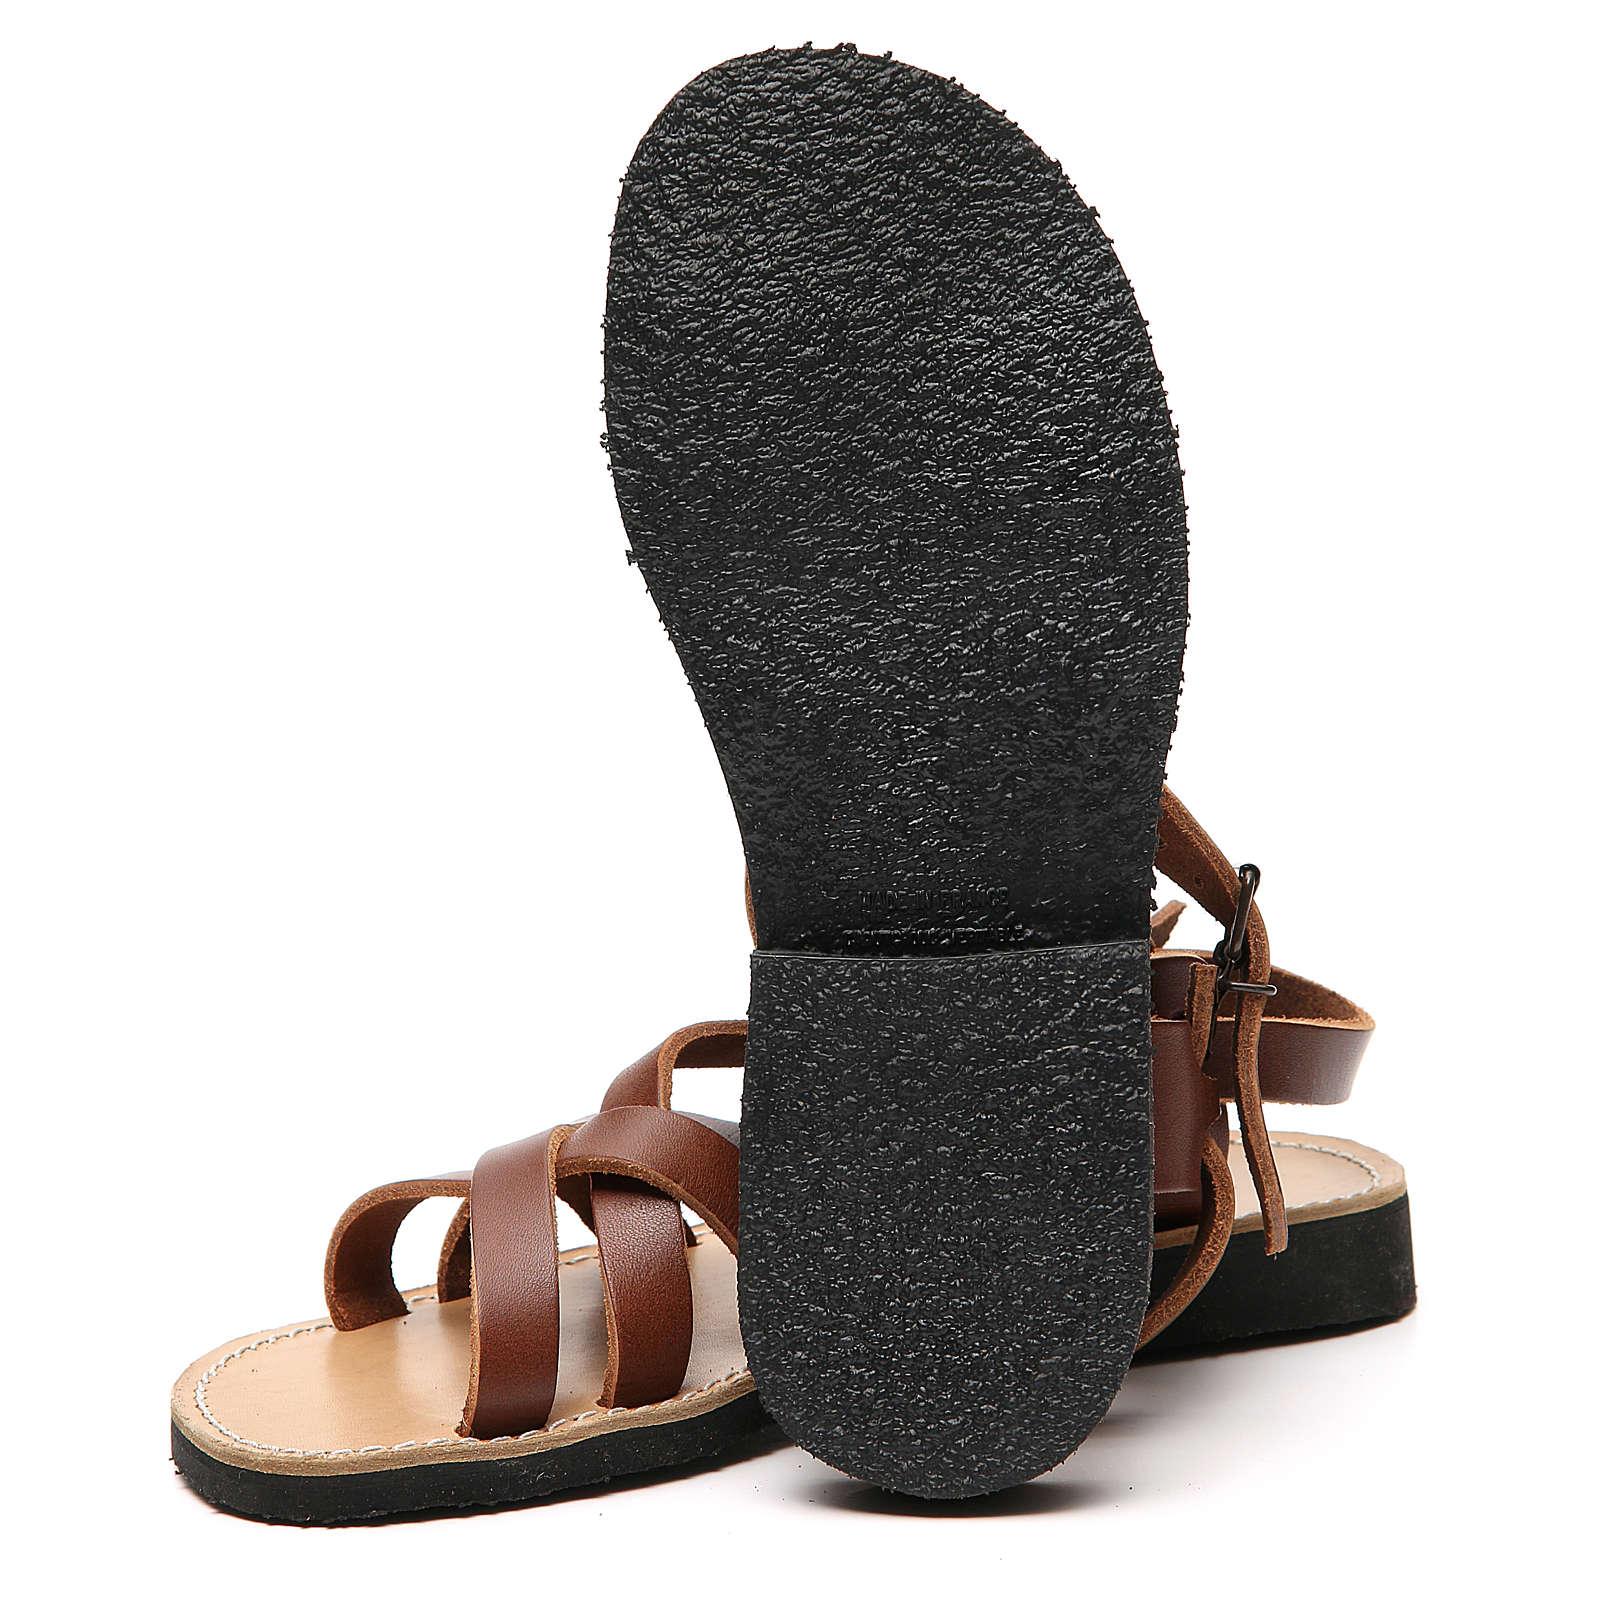 Franciscan Sandals in leather, model Samara 4